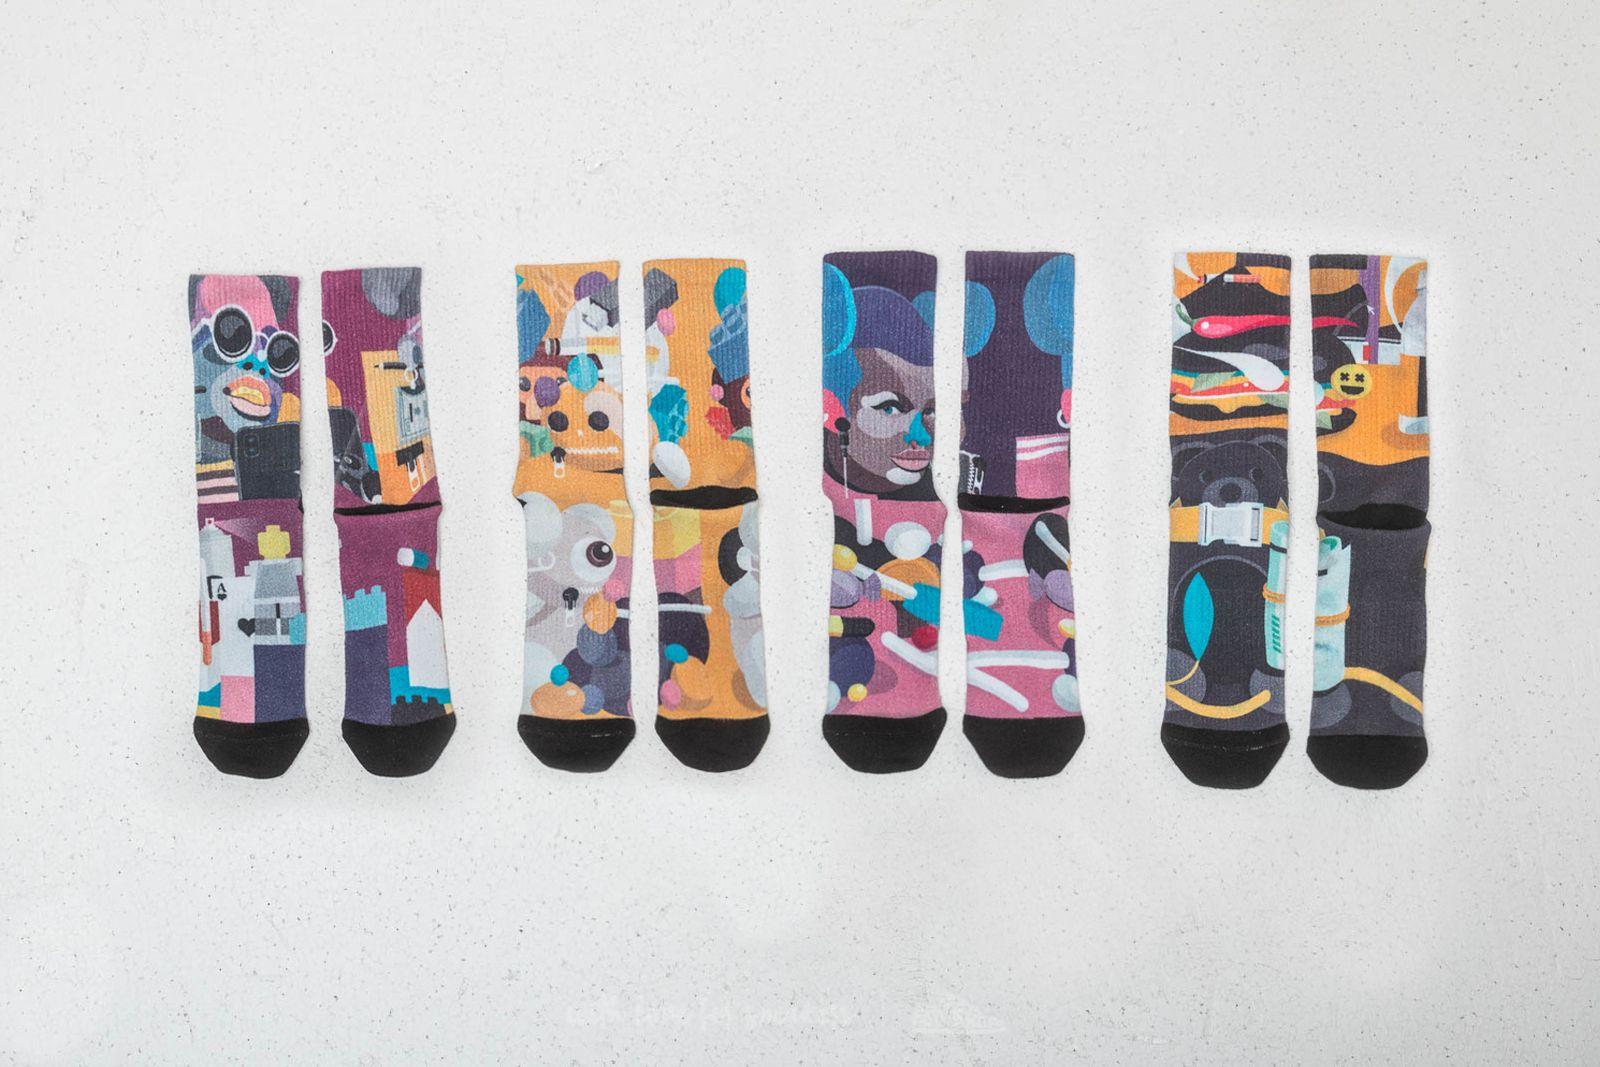 Čarape Moon Socks x Marek Mraz Pack Socks